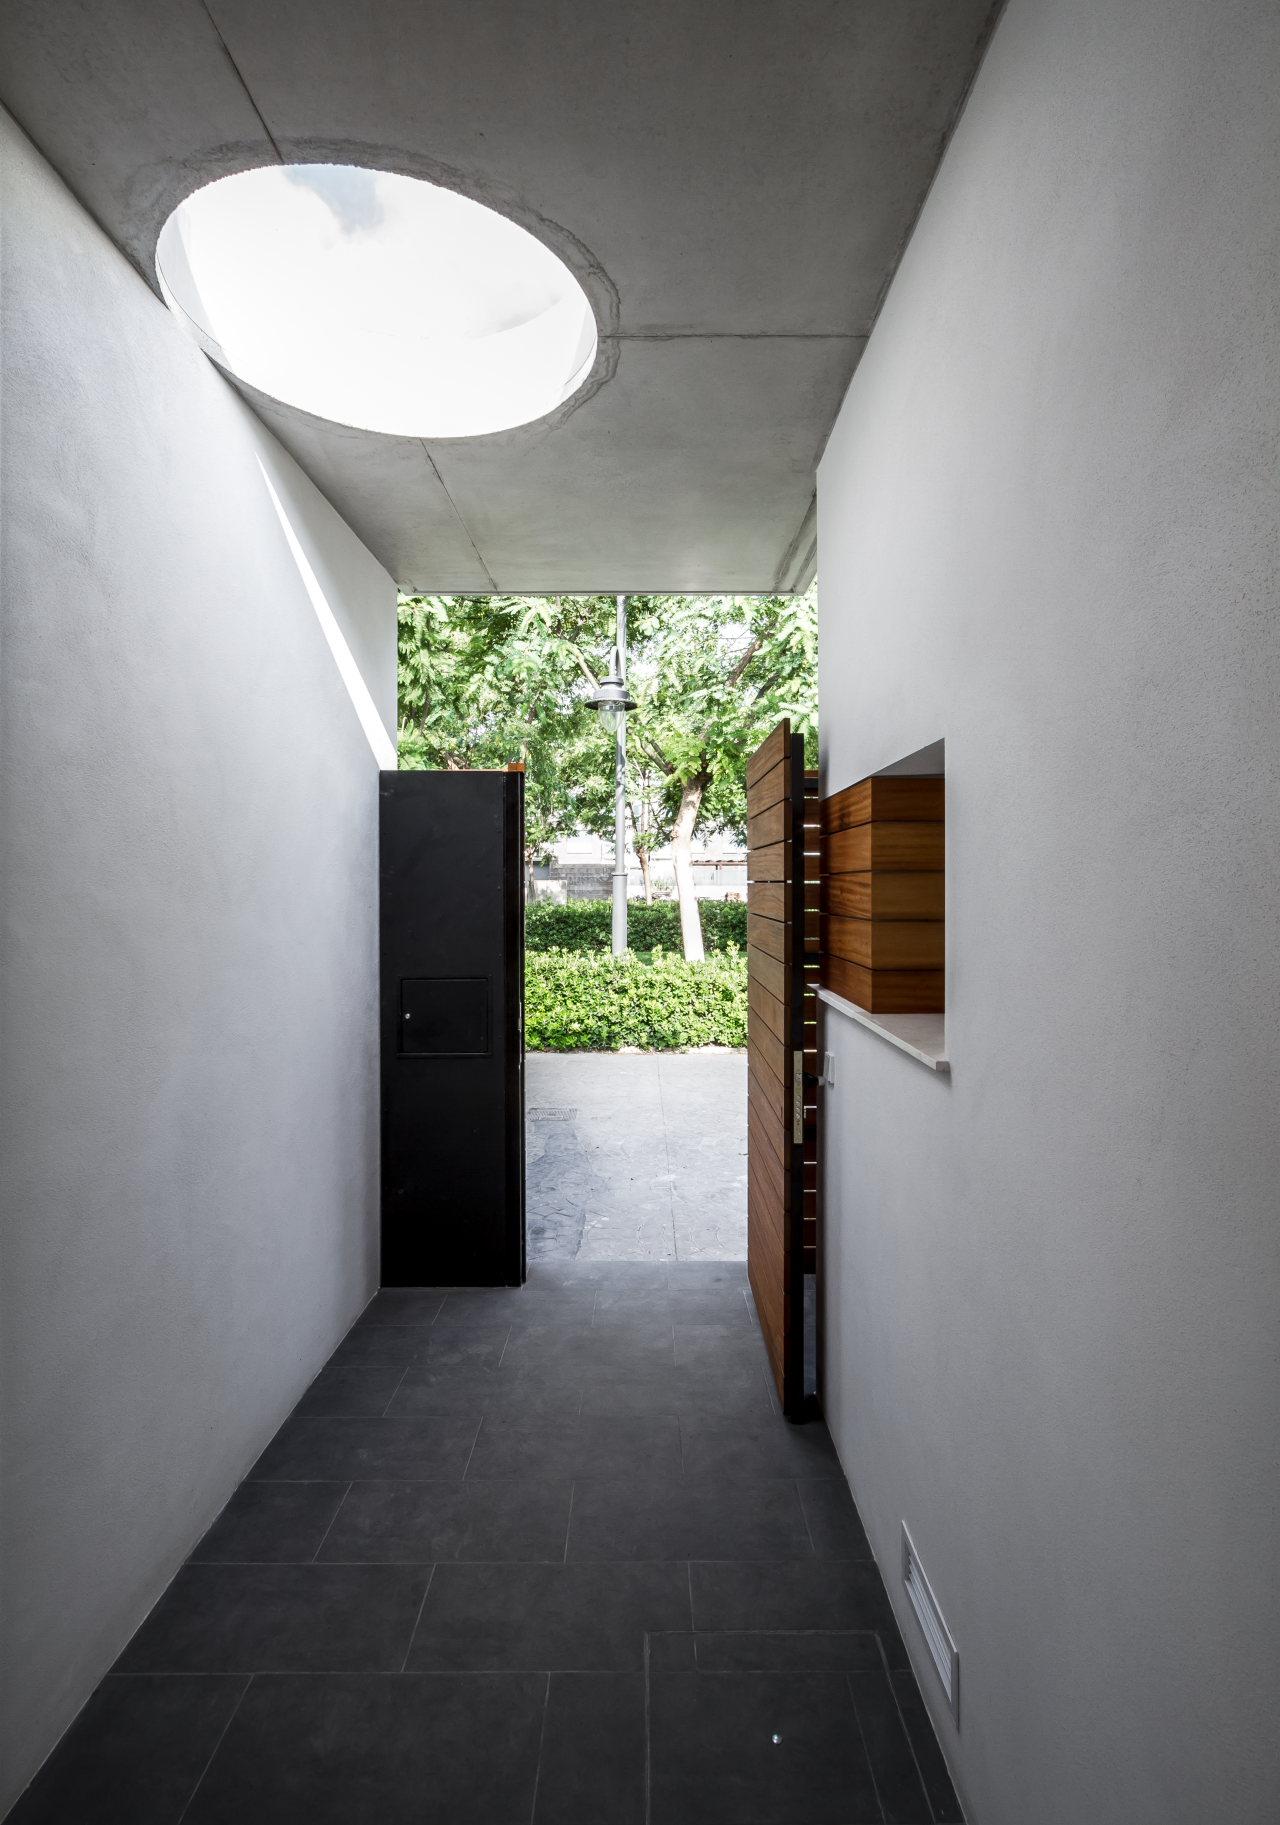 fotografia-arquitectura-valencia-german-cabo-viraje-museros (4)